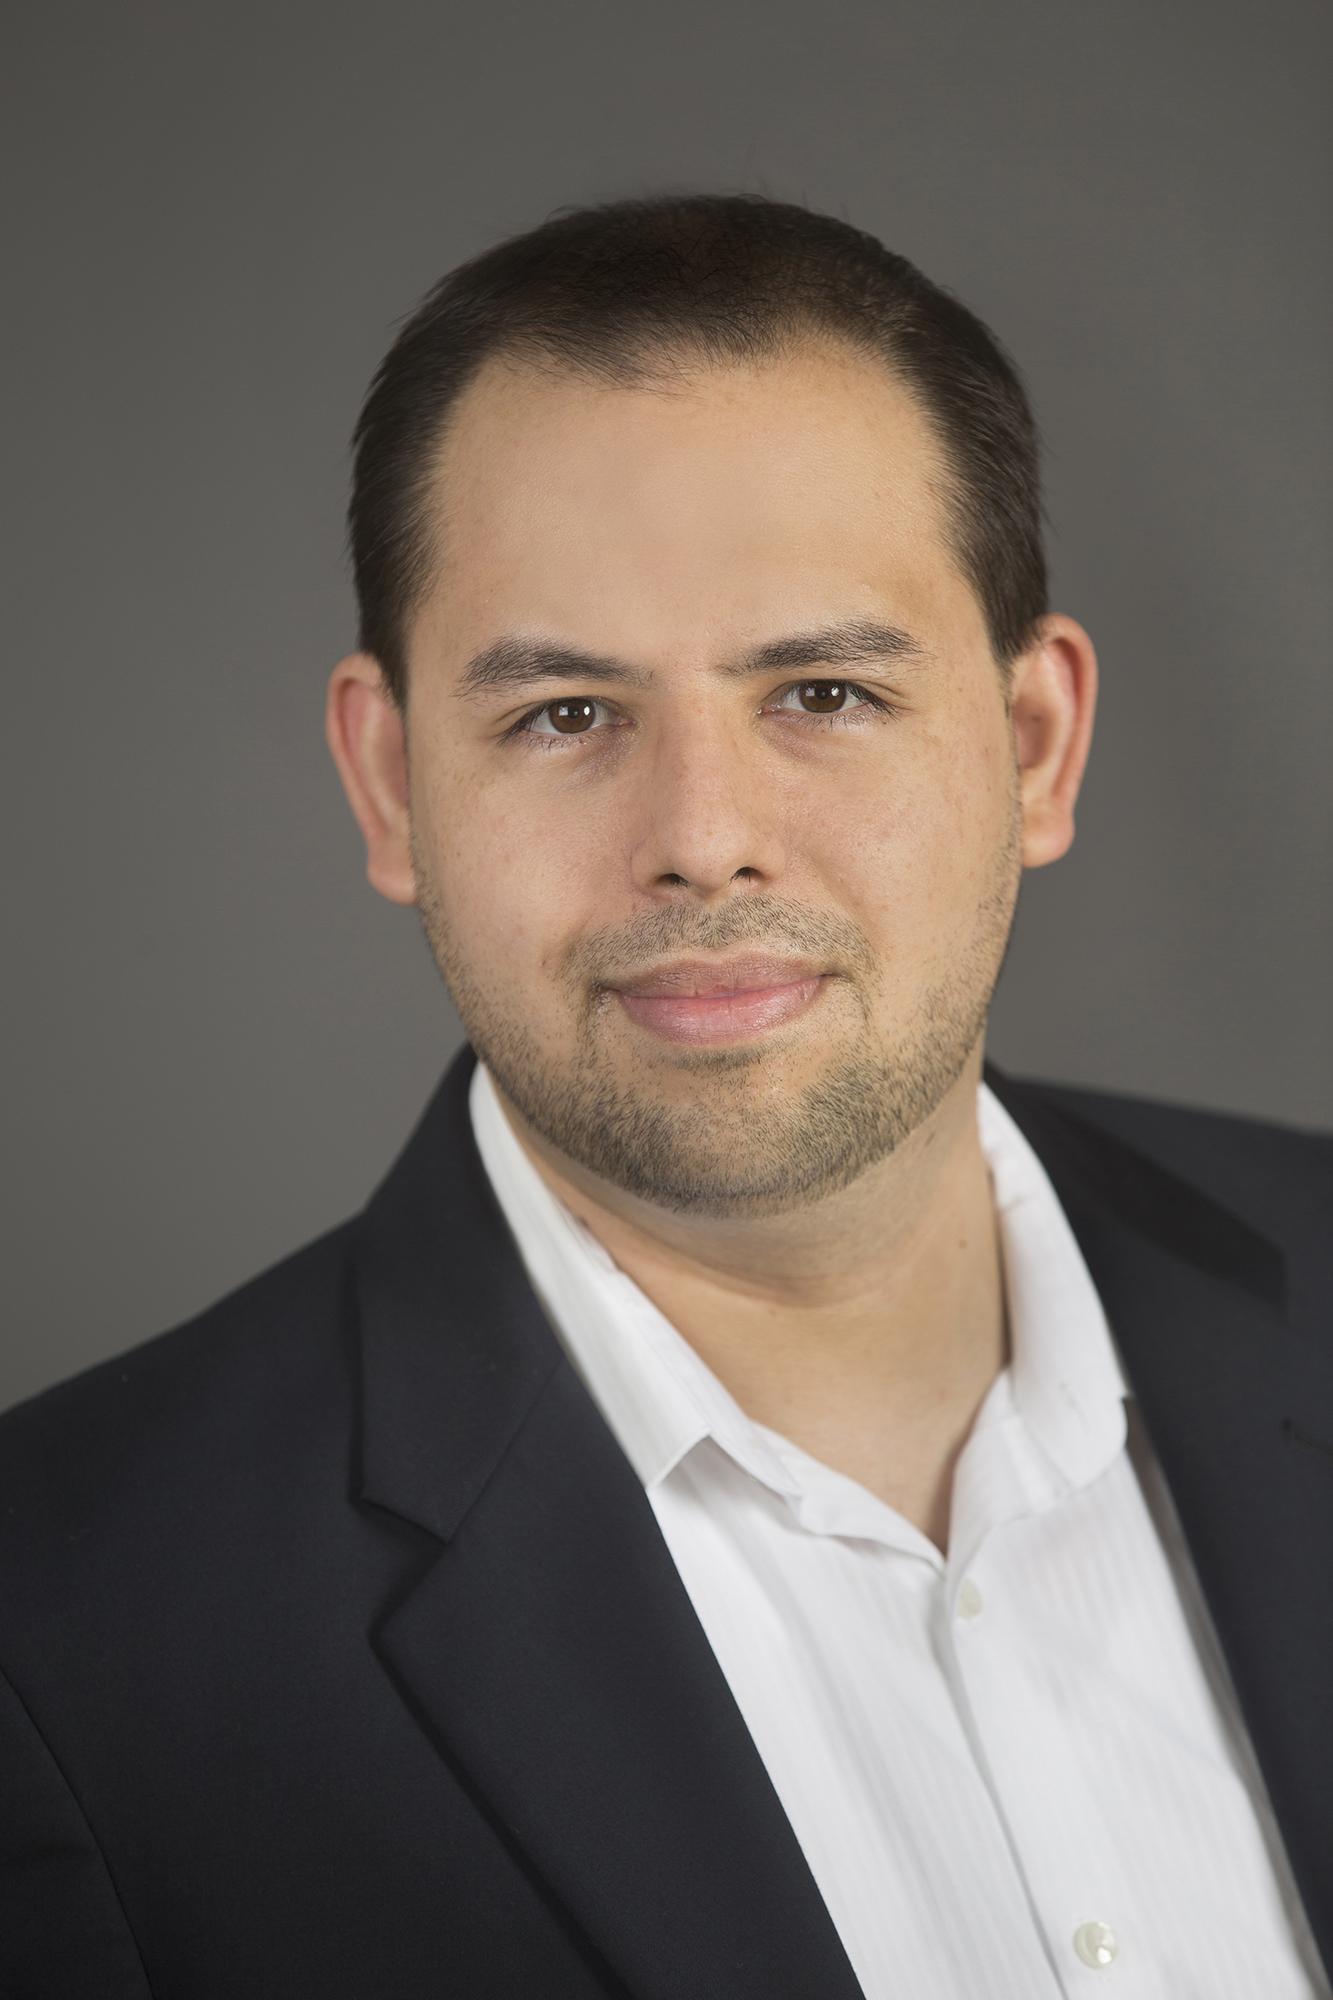 Headshot Environmental Portrait of a Businessman